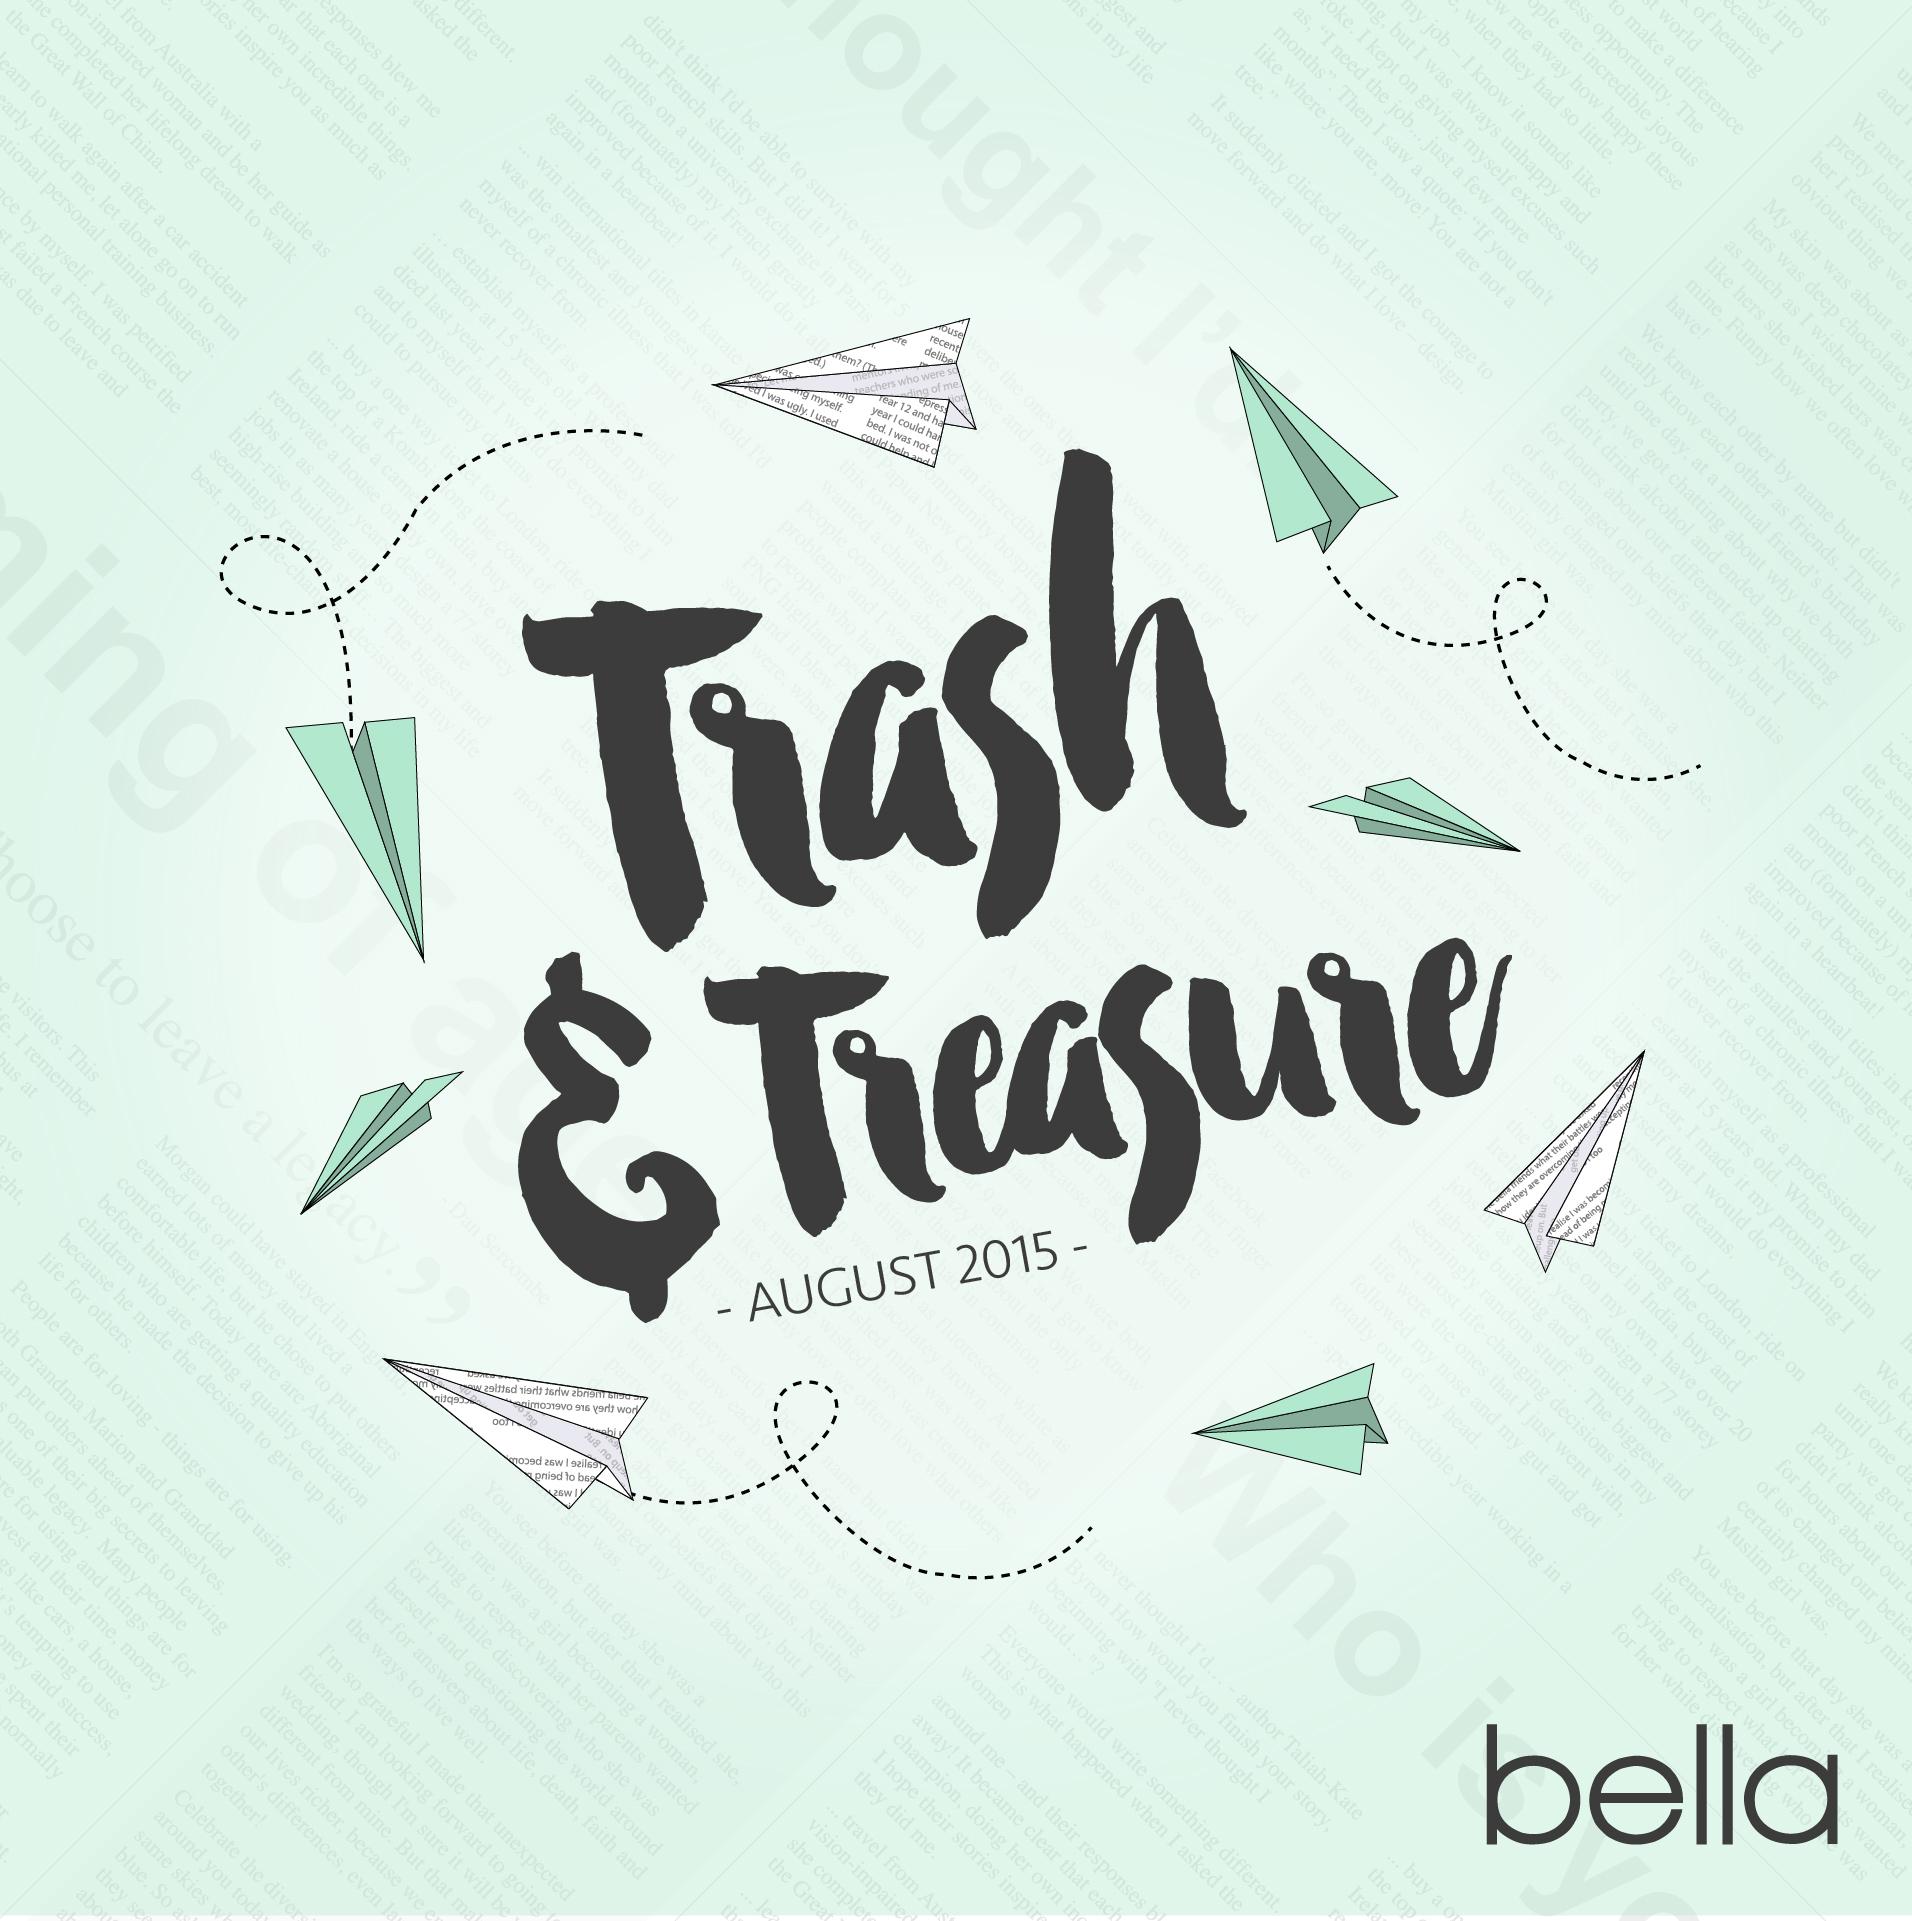 Trash and treasure, August 2015, bella magazine.